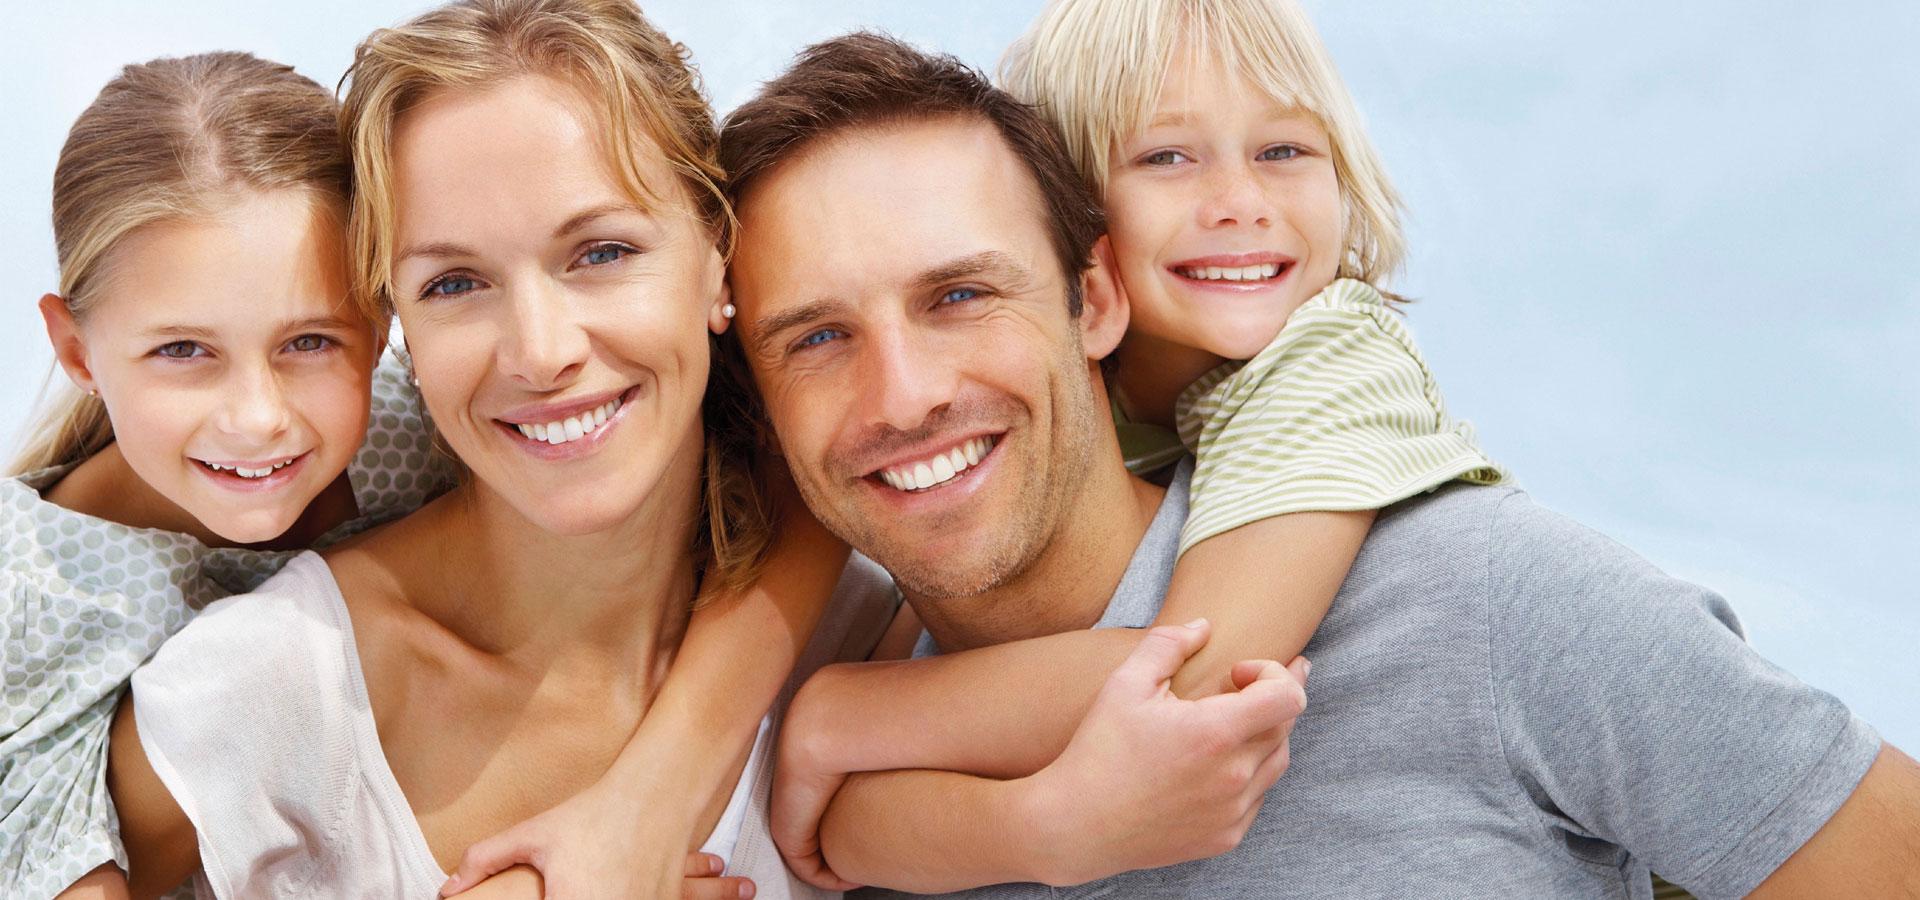 mount pleasant family dentist